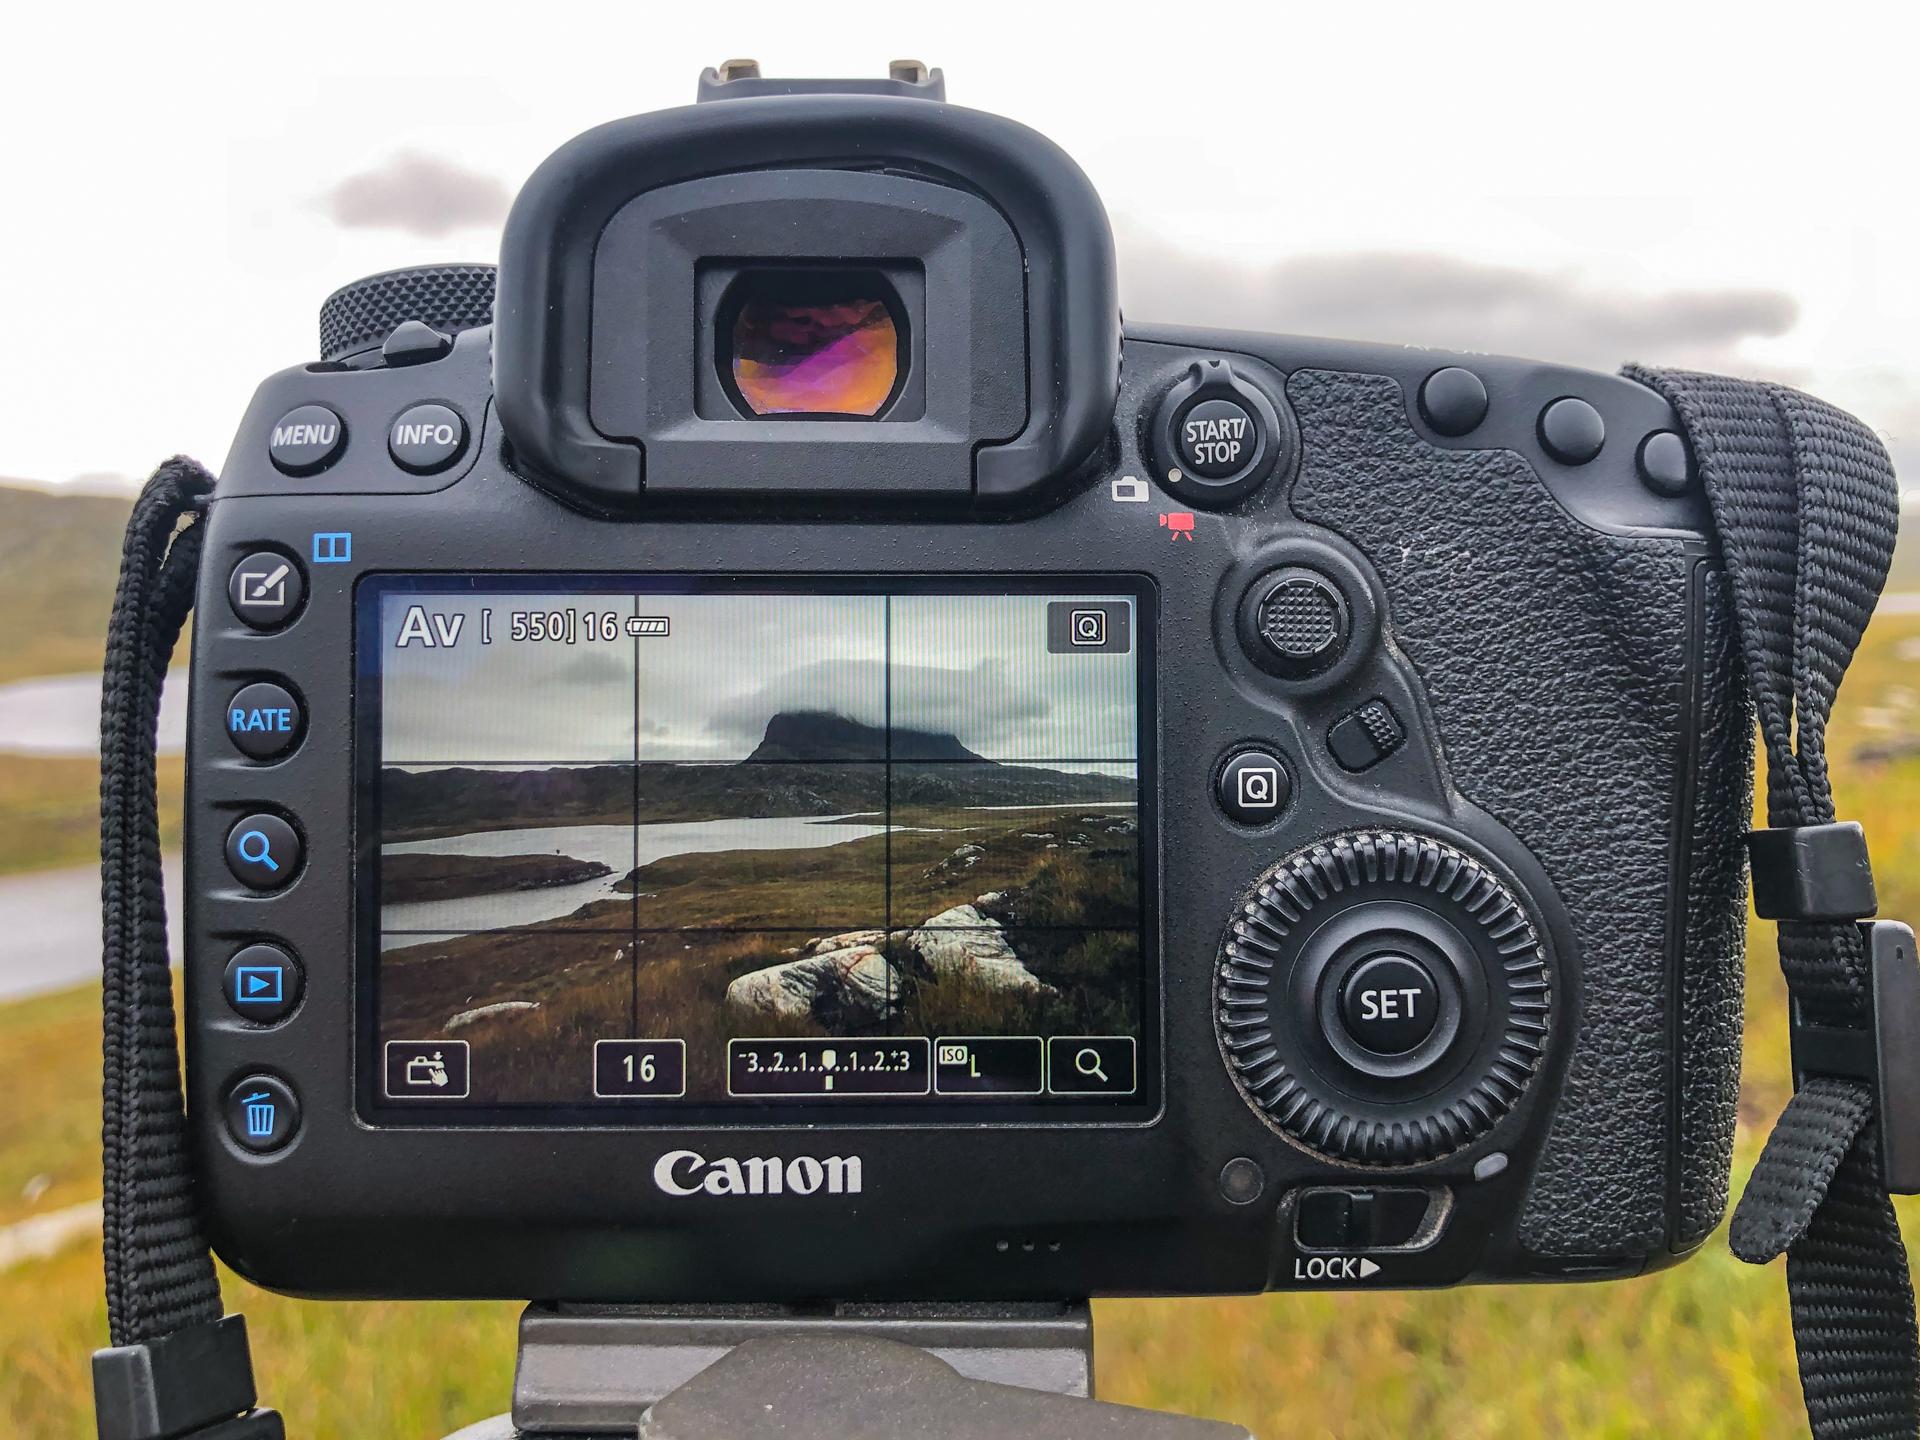 A landscape scene as seen through an LCD screen on a DSLR